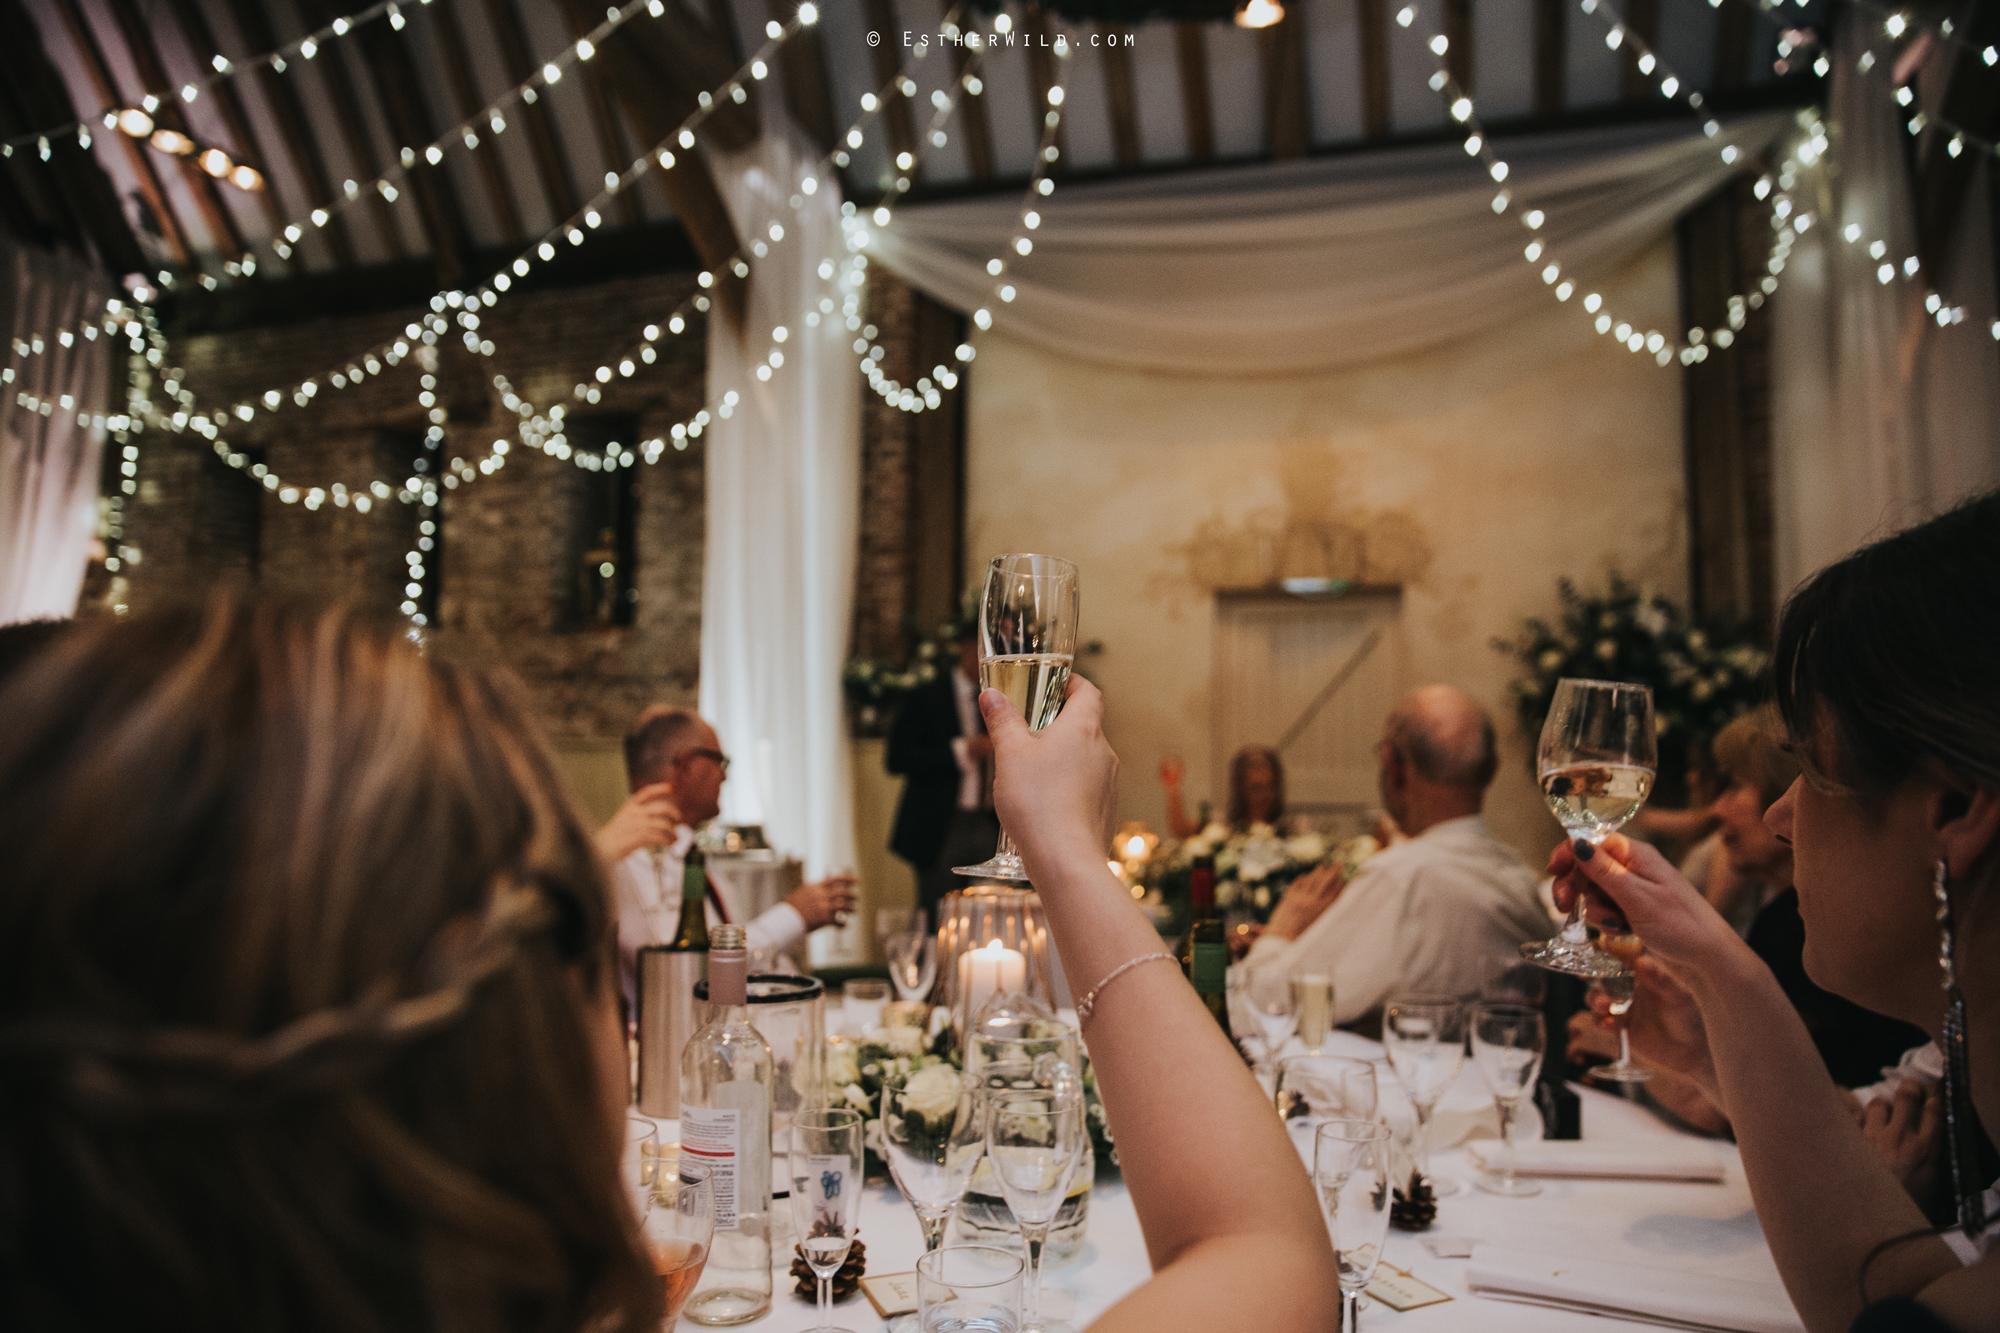 Elms_Barn_Weddings_Suffolk_Photographer_Copyright_Esther_Wild_IMG_2915.jpg